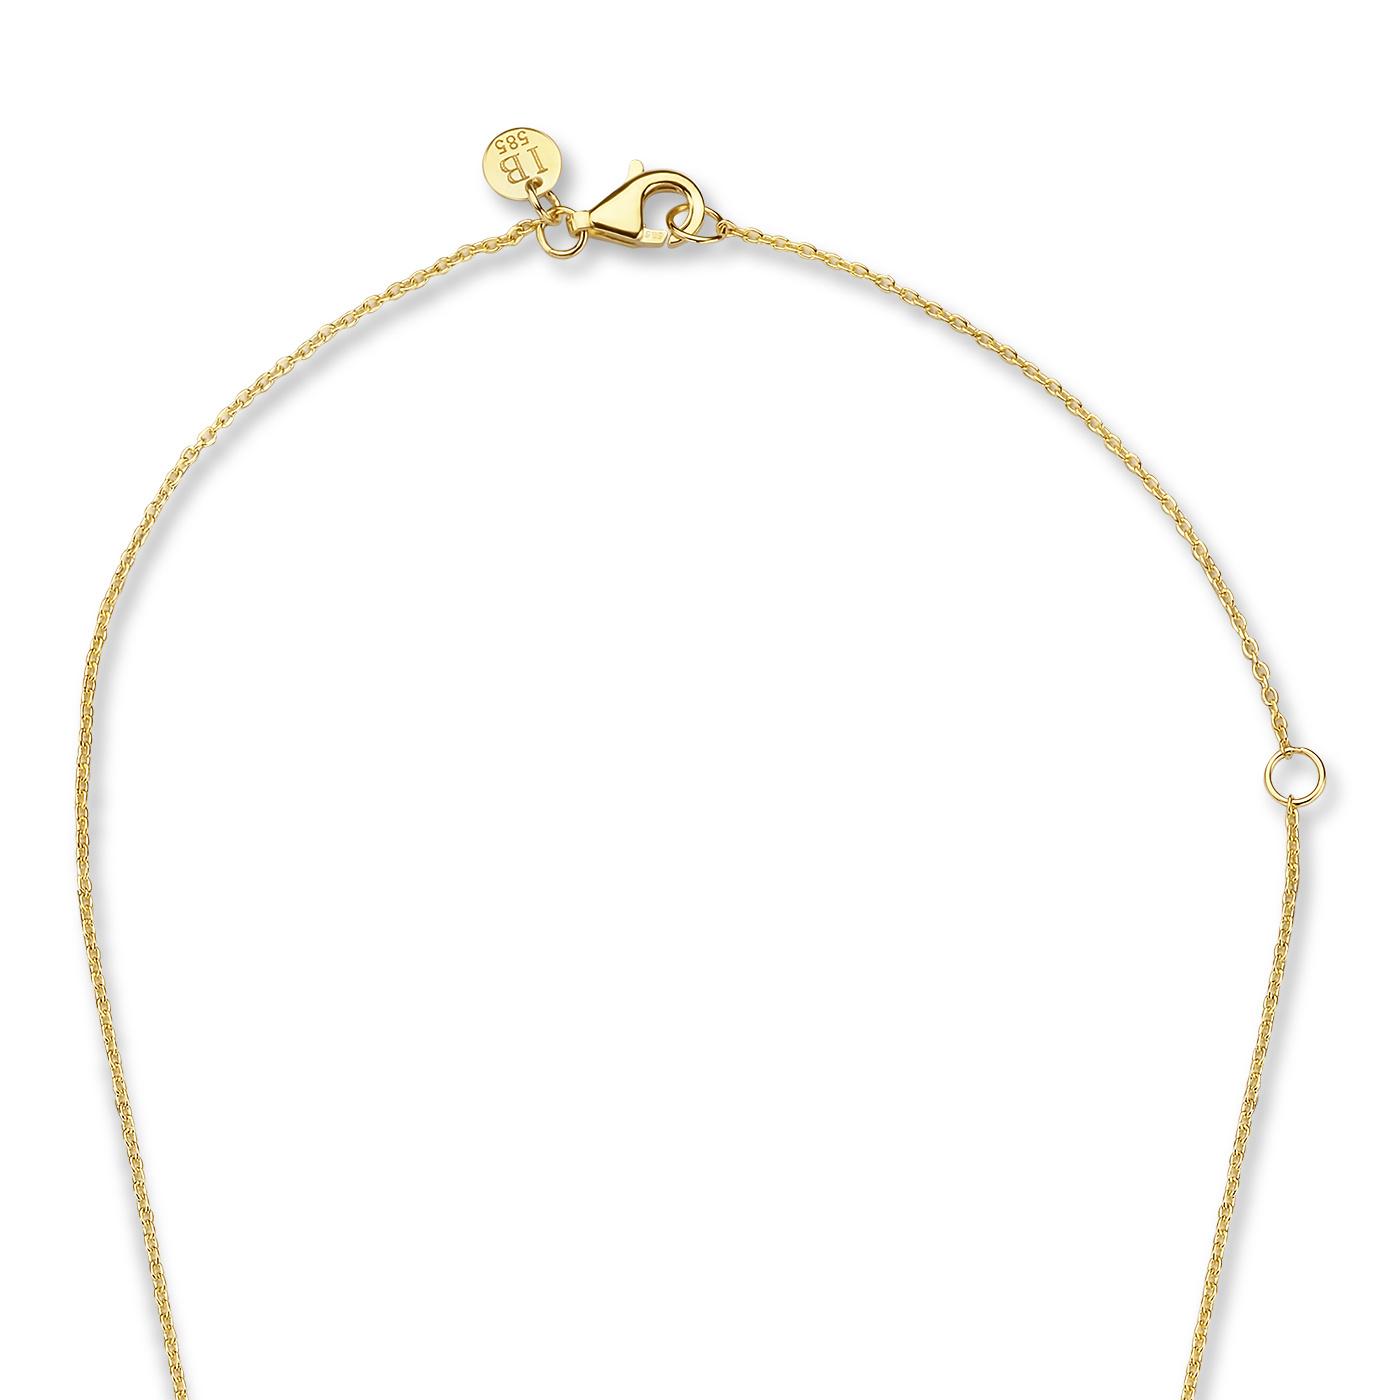 Isabel Bernard Belleville Mila 14 karaat gouden collier